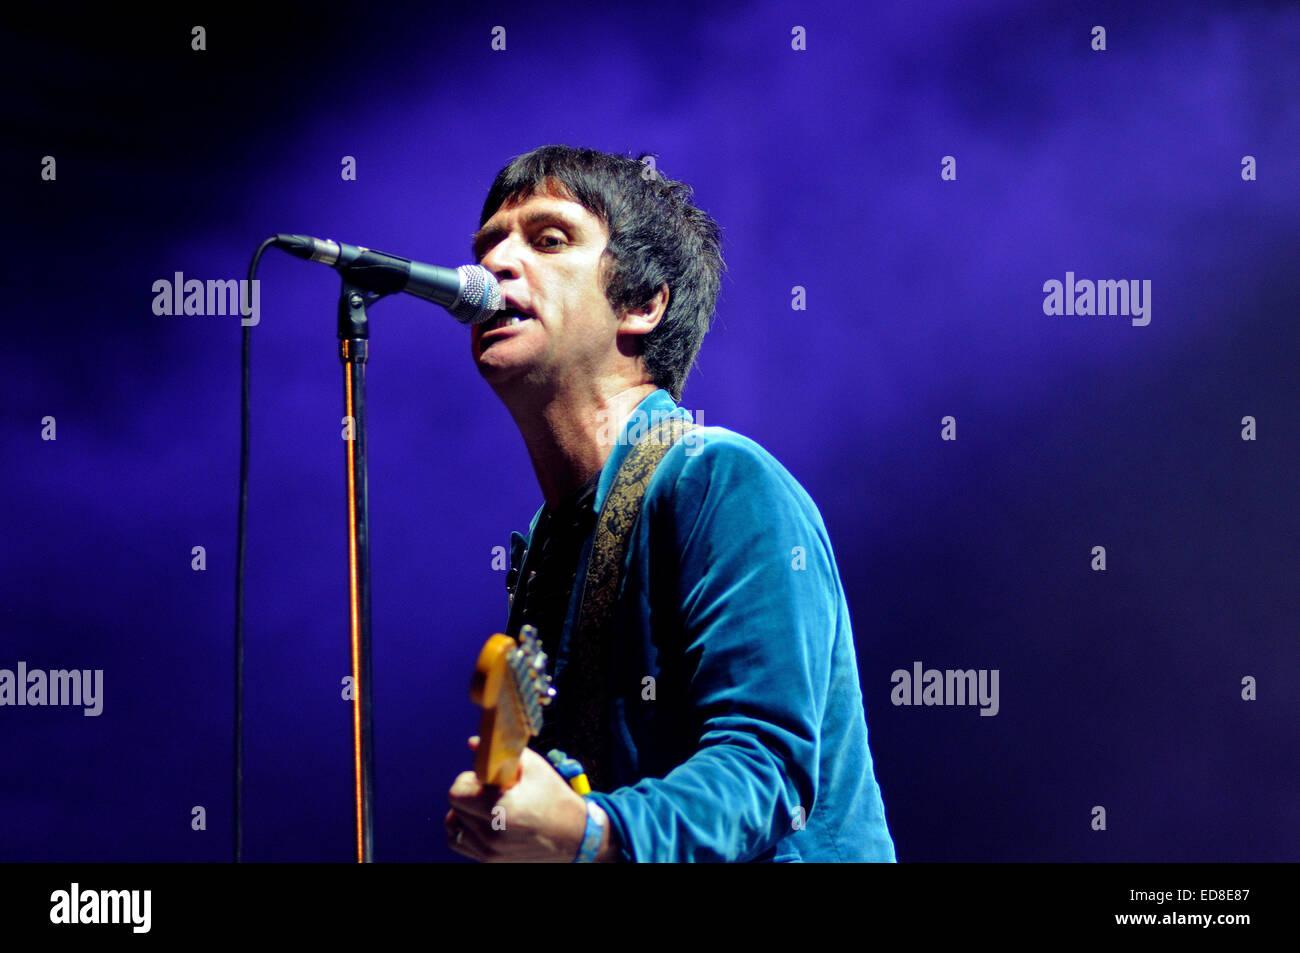 BENICASIM, SPAIN - JULY 19: Johnny Marr band concert performance at FIB (Festival Internacional de Benicassim) 2013 - Stock Image